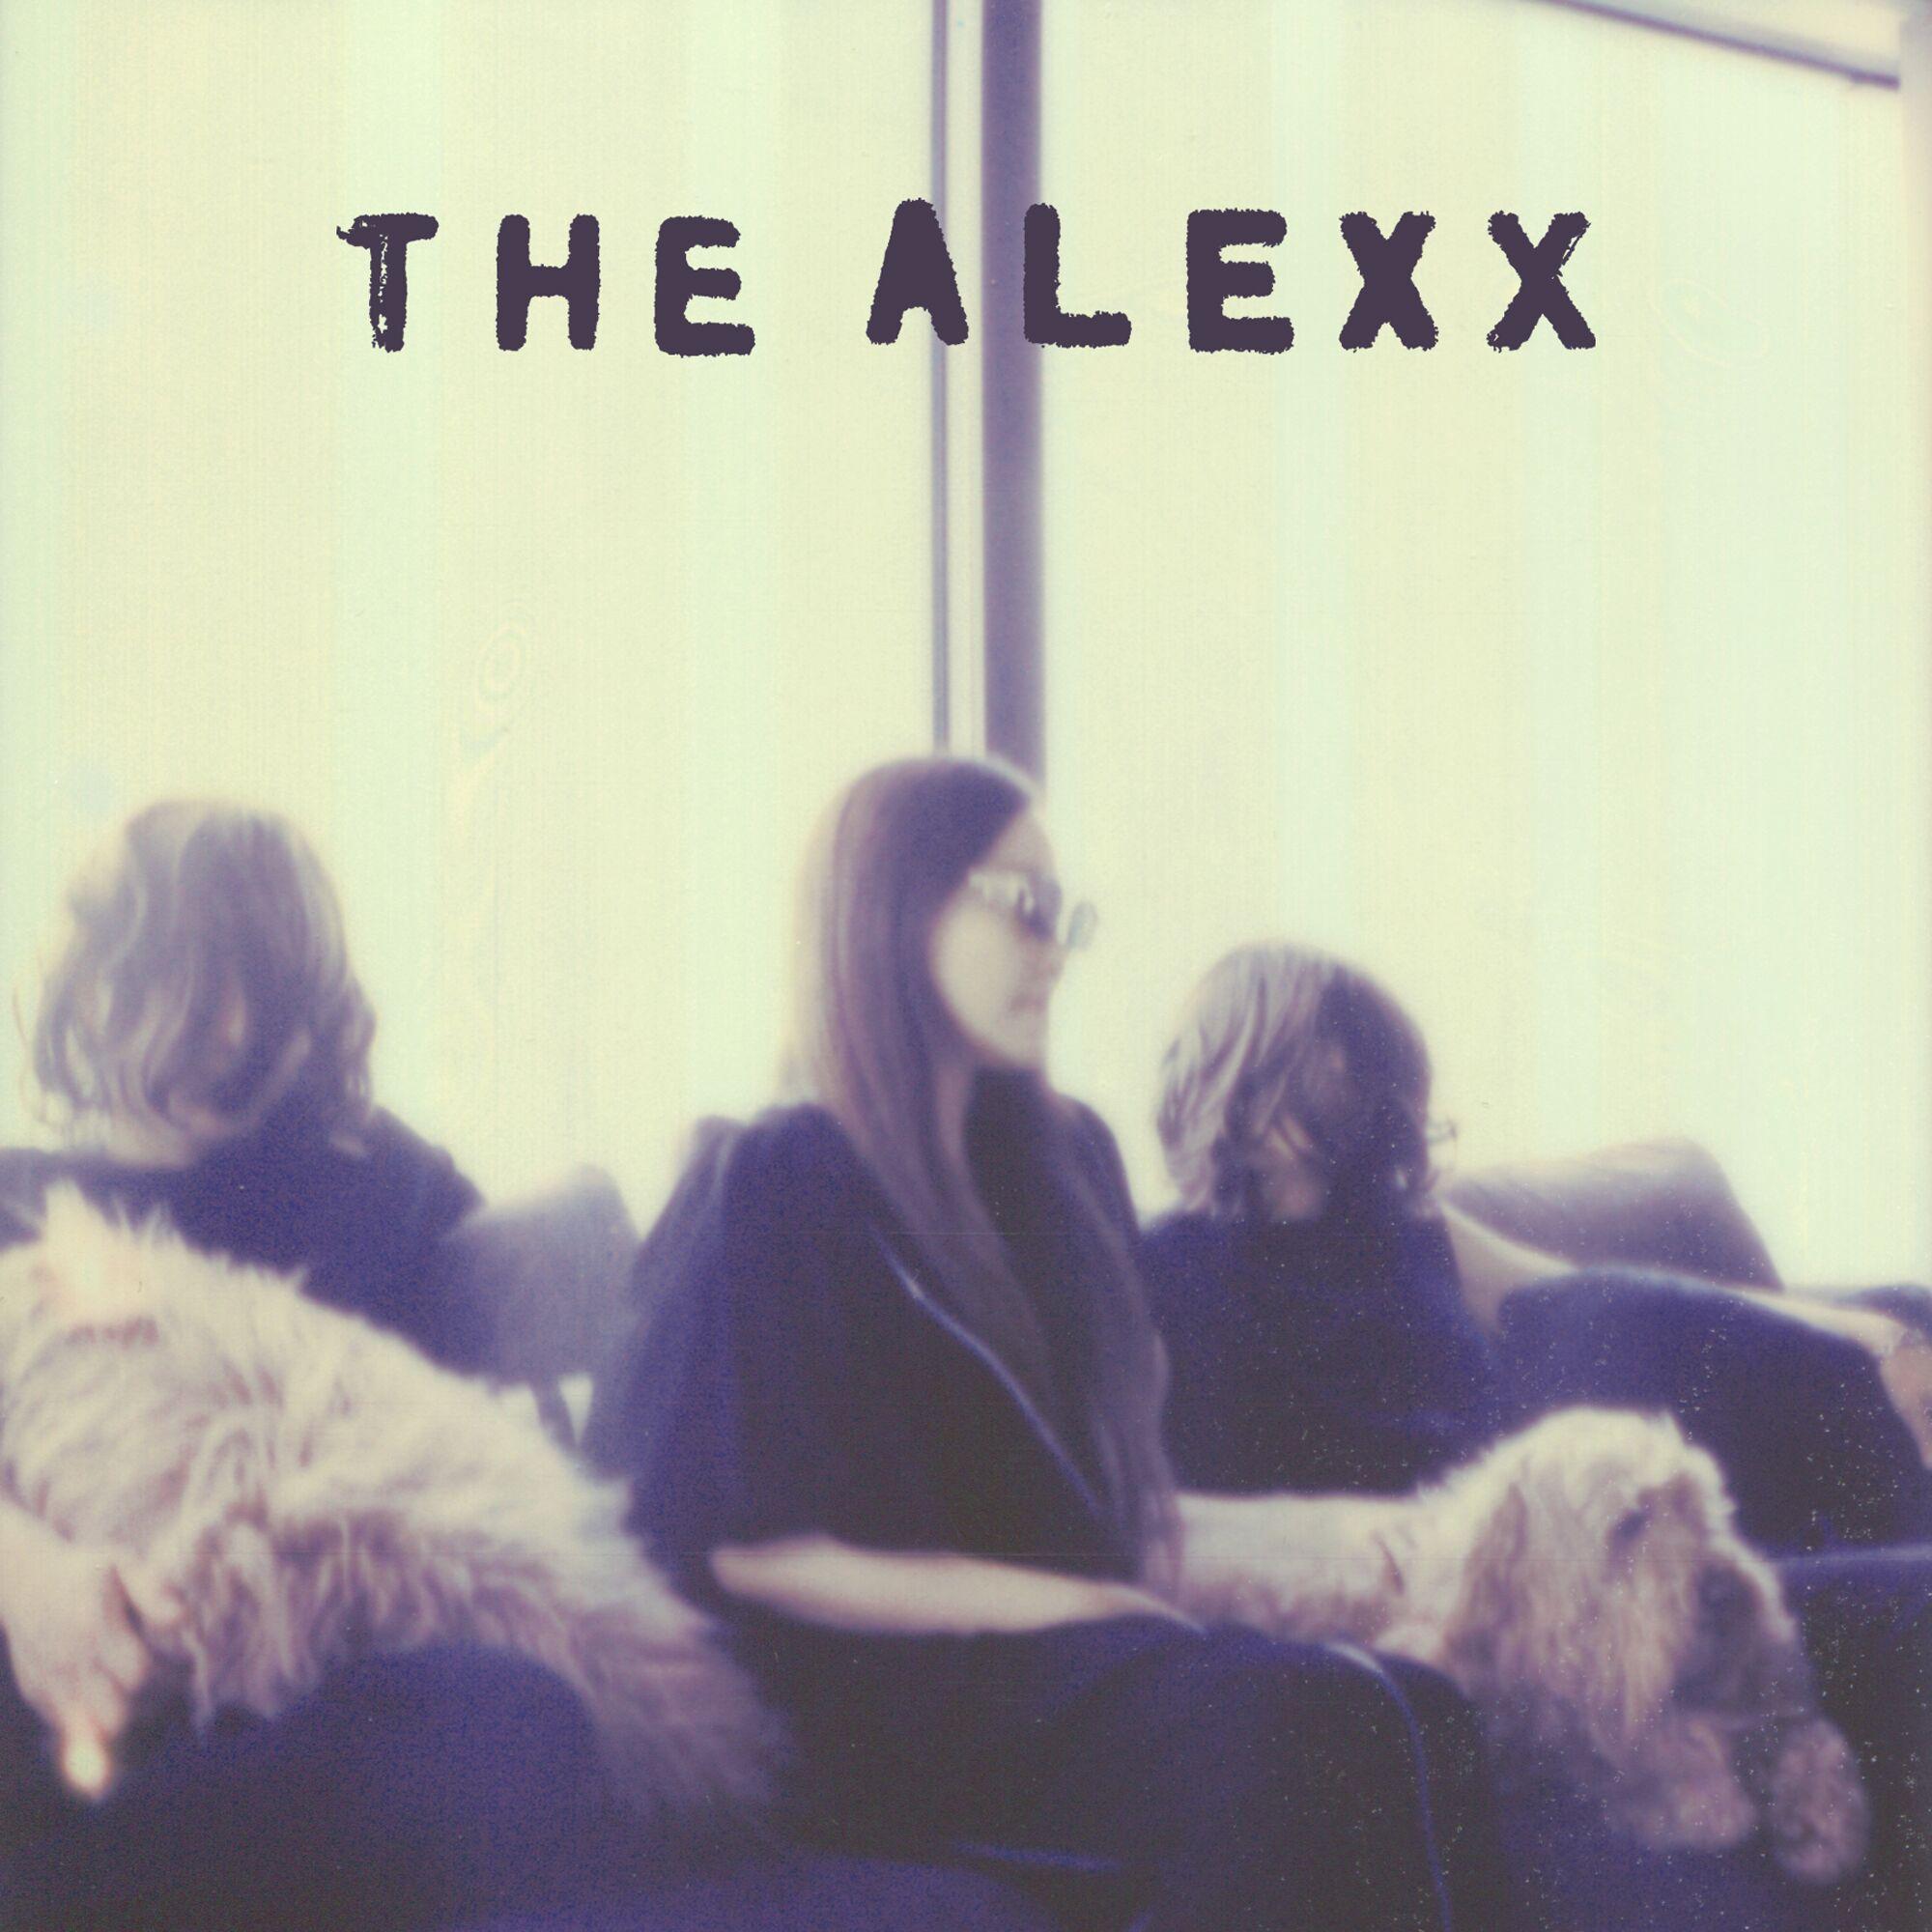 THE ALEXX デビュー作品『VANTABLACK』岩盤キャンペーン決定!